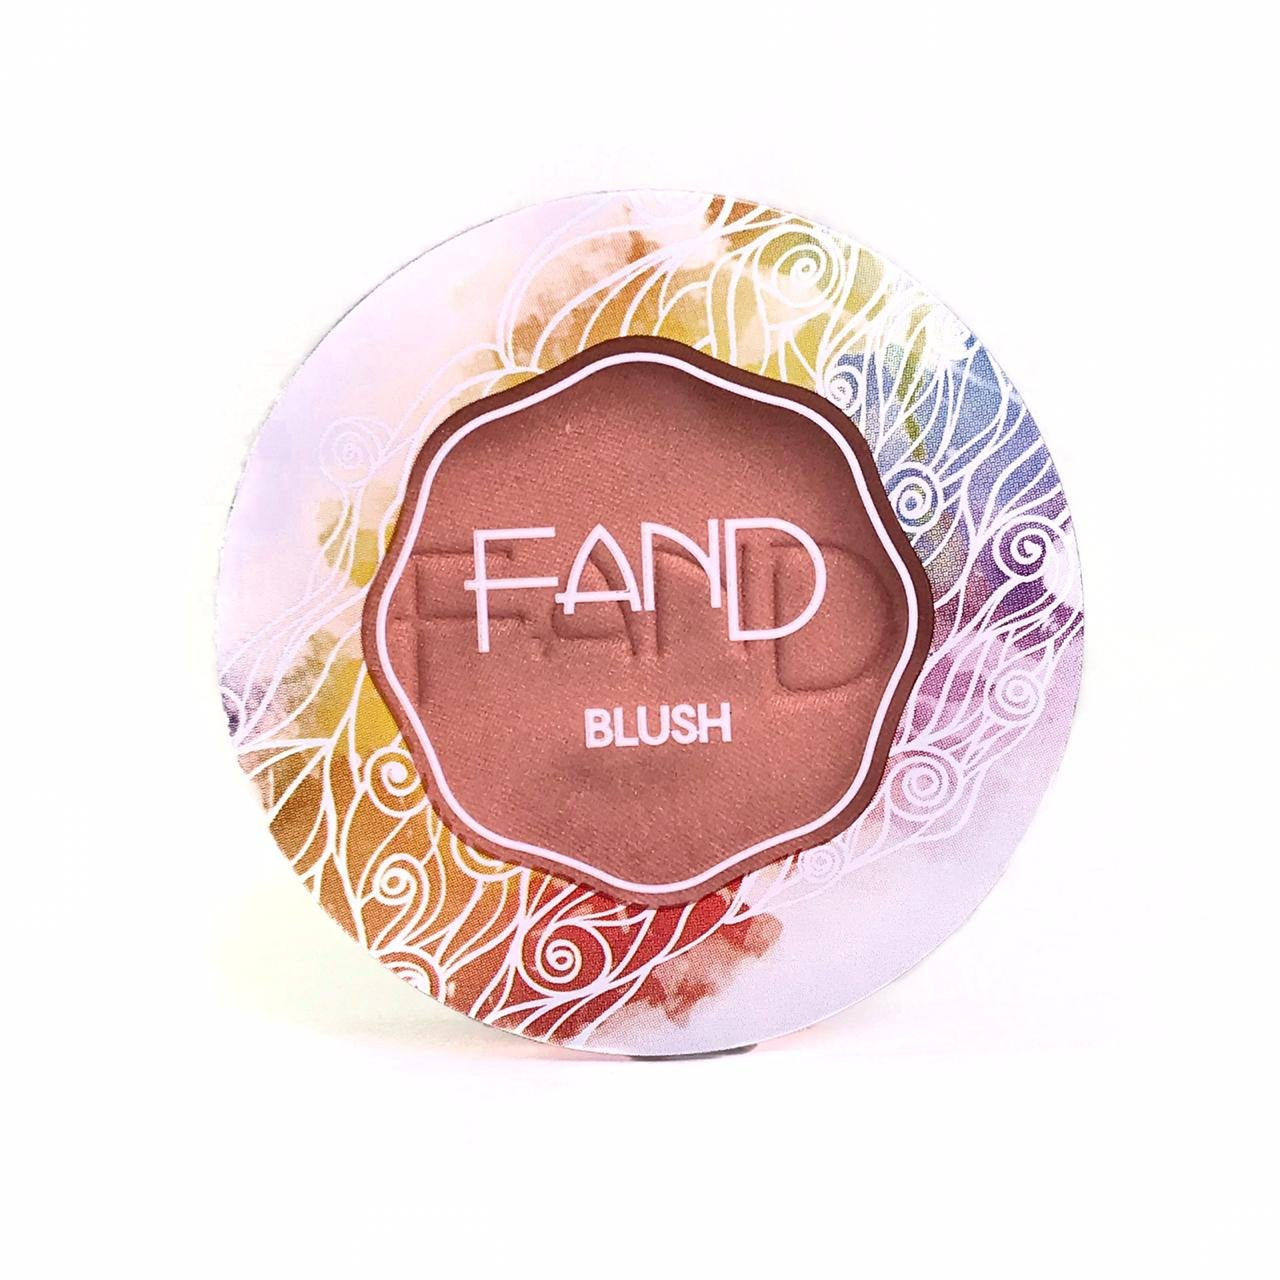 Blush - Fand Makeup